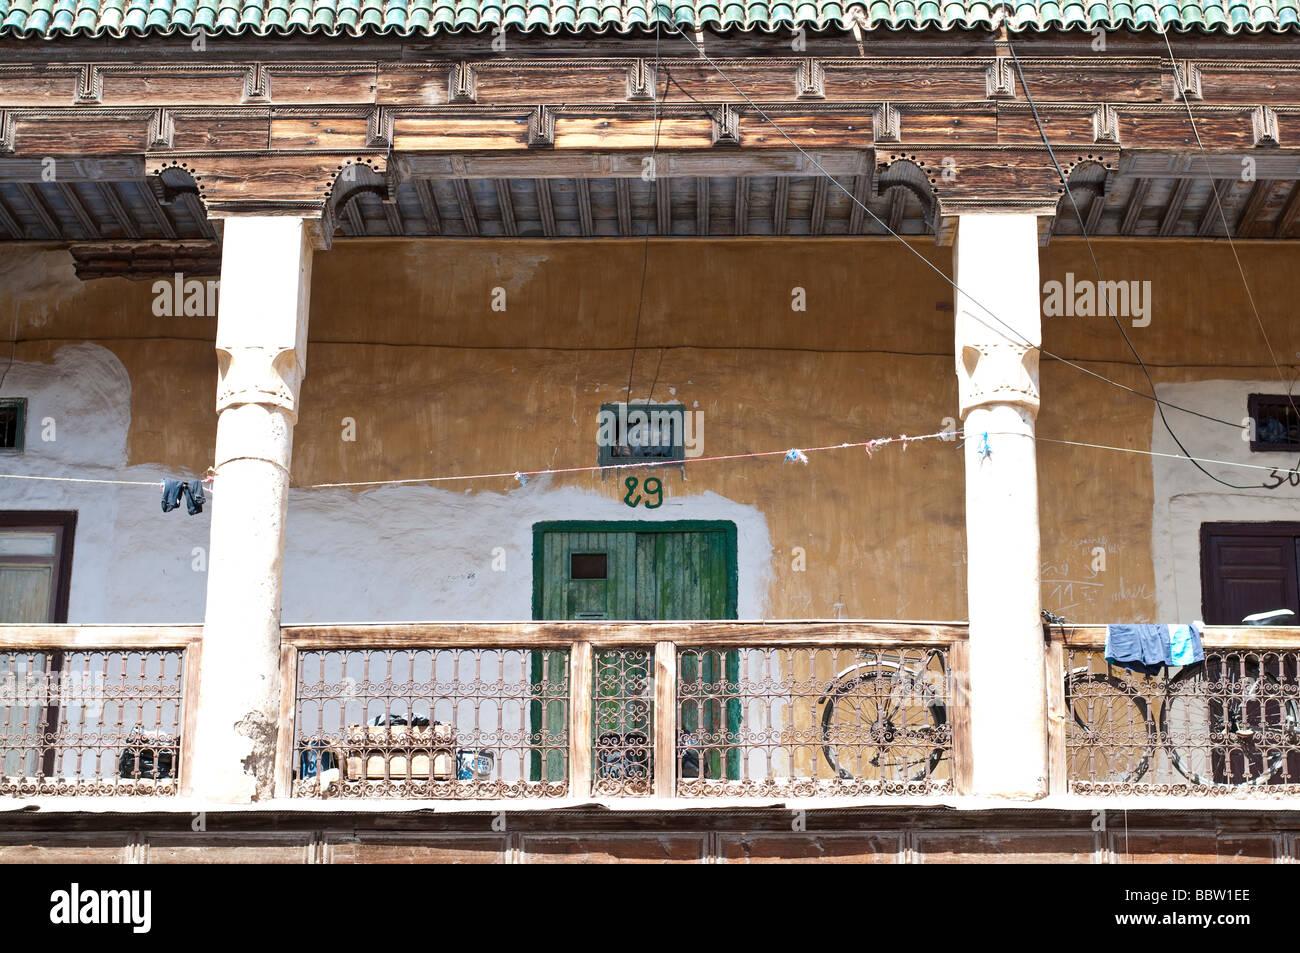 A scene off the Djemaa el Fna square in Marrakesh Morocco - Stock Image